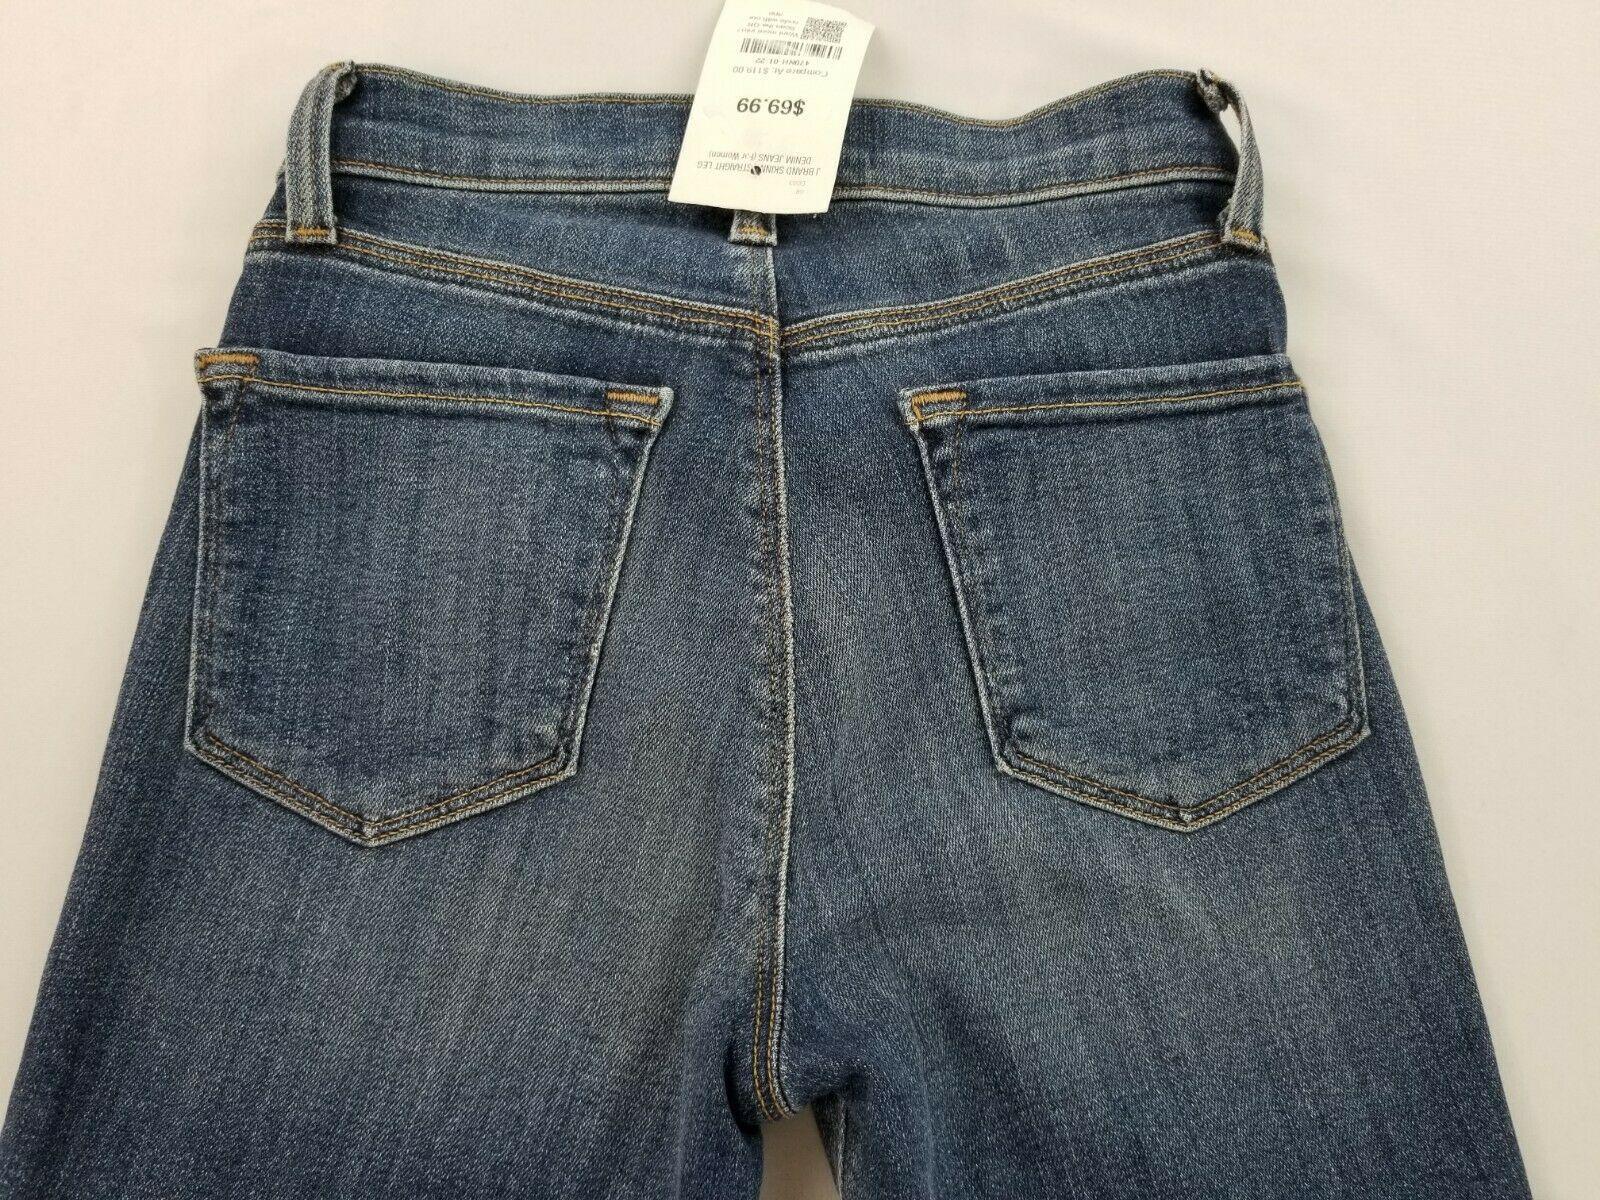 Neuf J Brand Femme Jeans Skinny Maria 23110O212 Divulgation Bleu Sz 22 Pdsf image 6